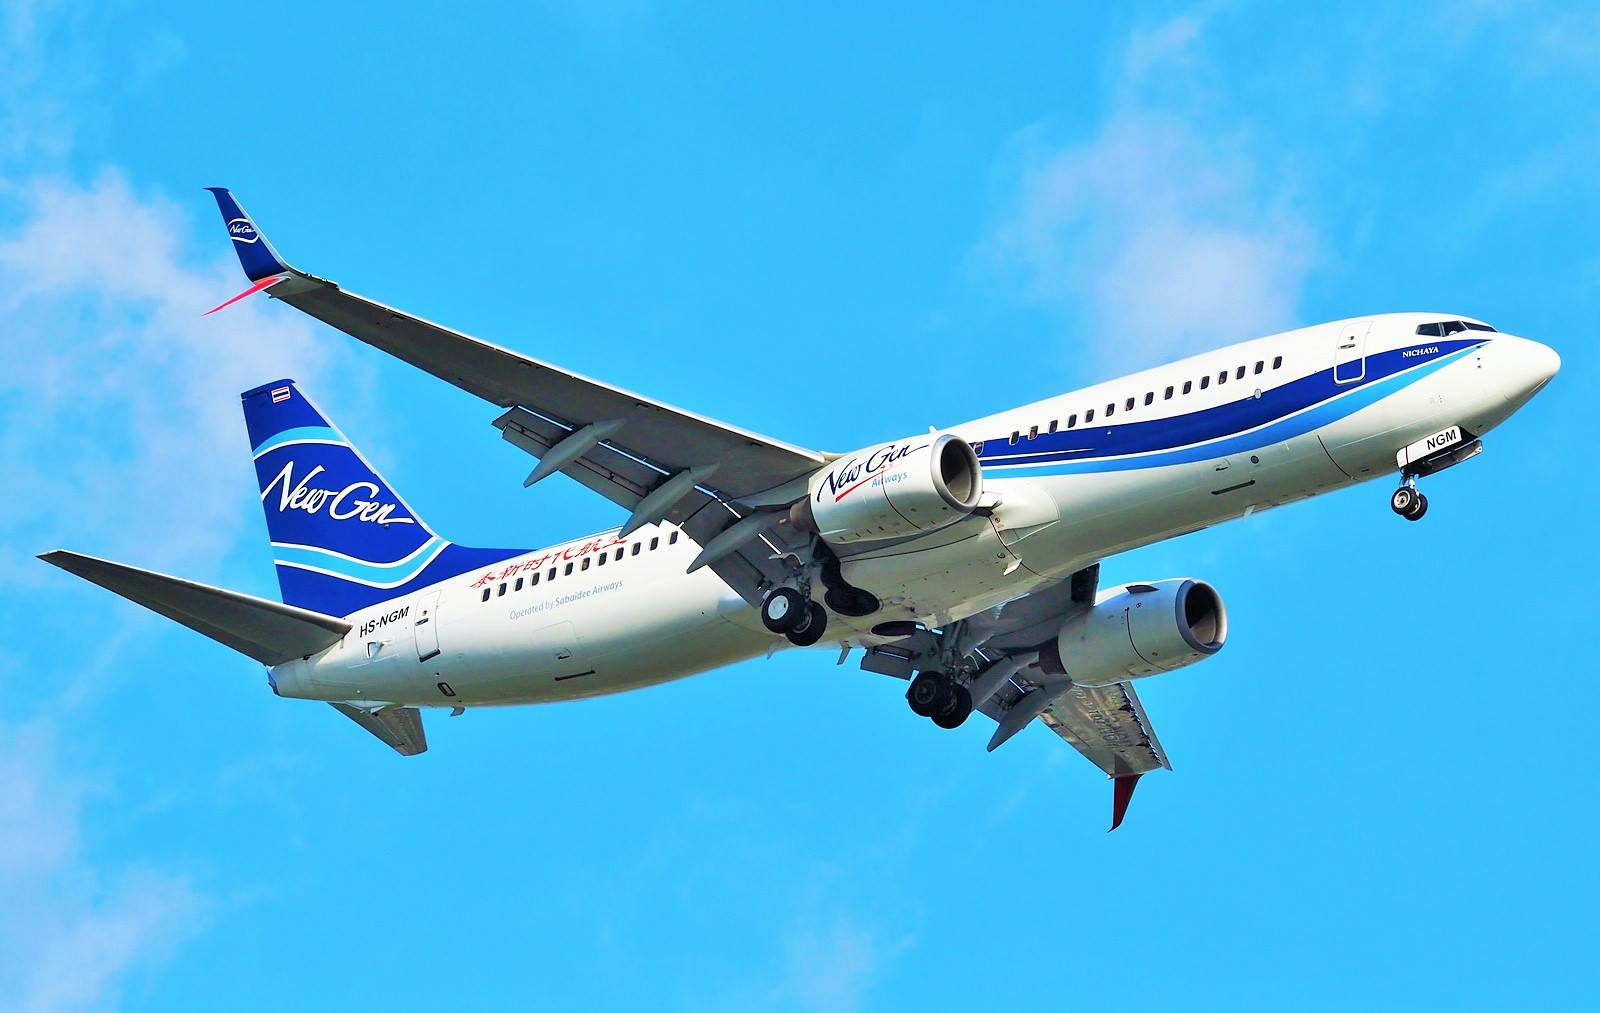 New Jane Airways Airlines that people trust in Koratpic